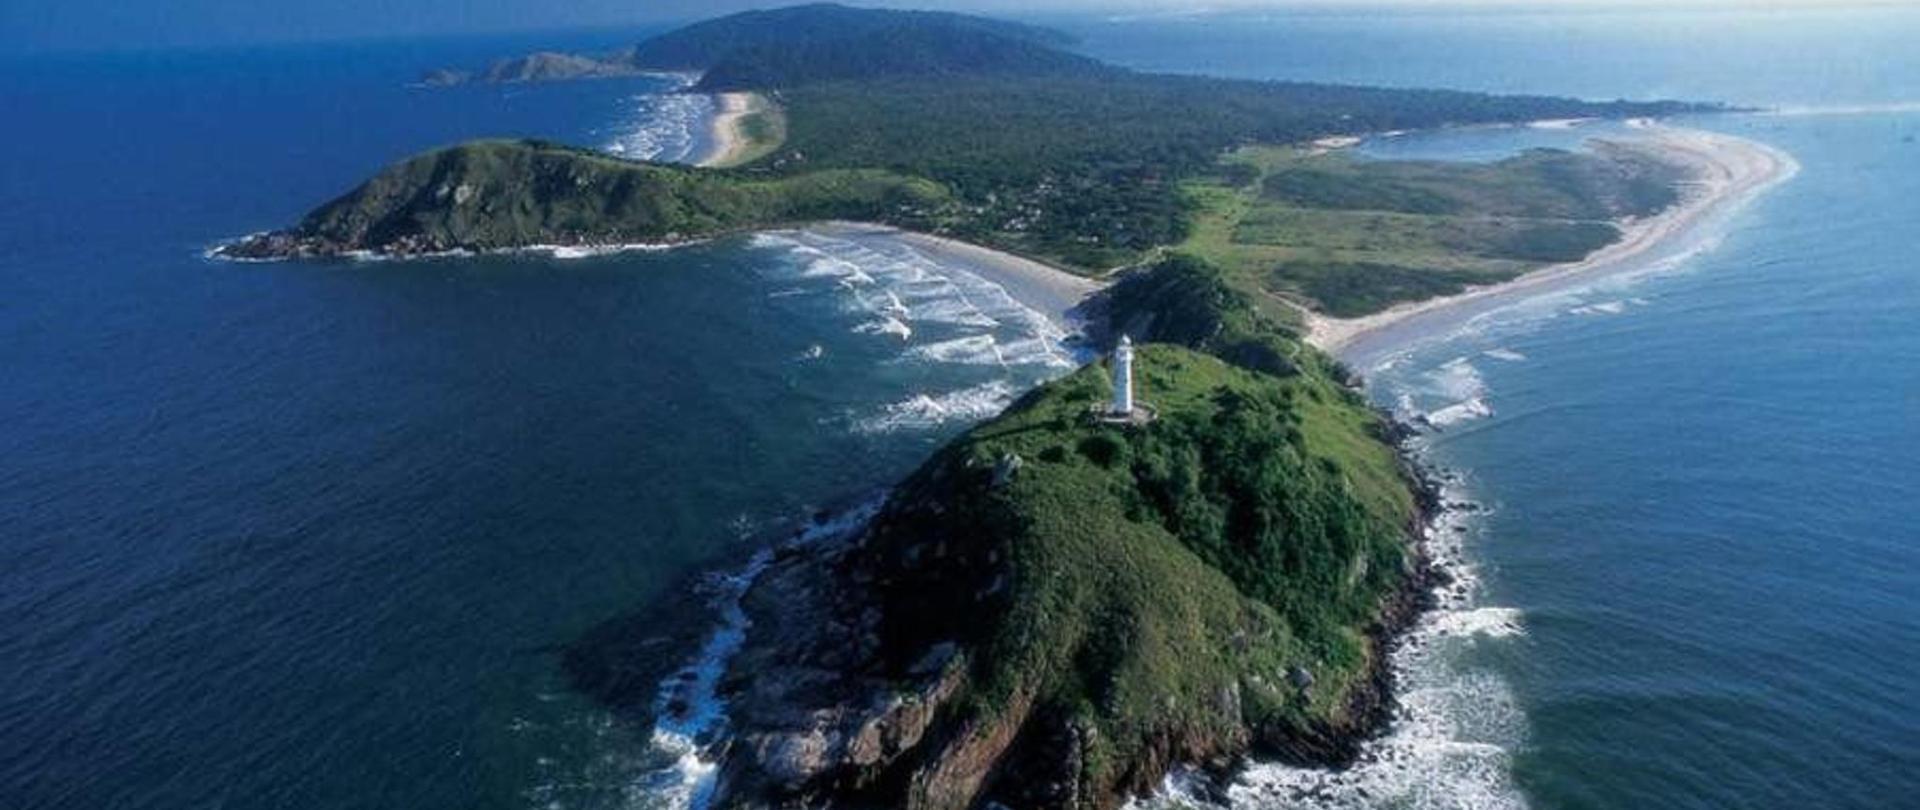 ilha-do-mel1-1.jpg